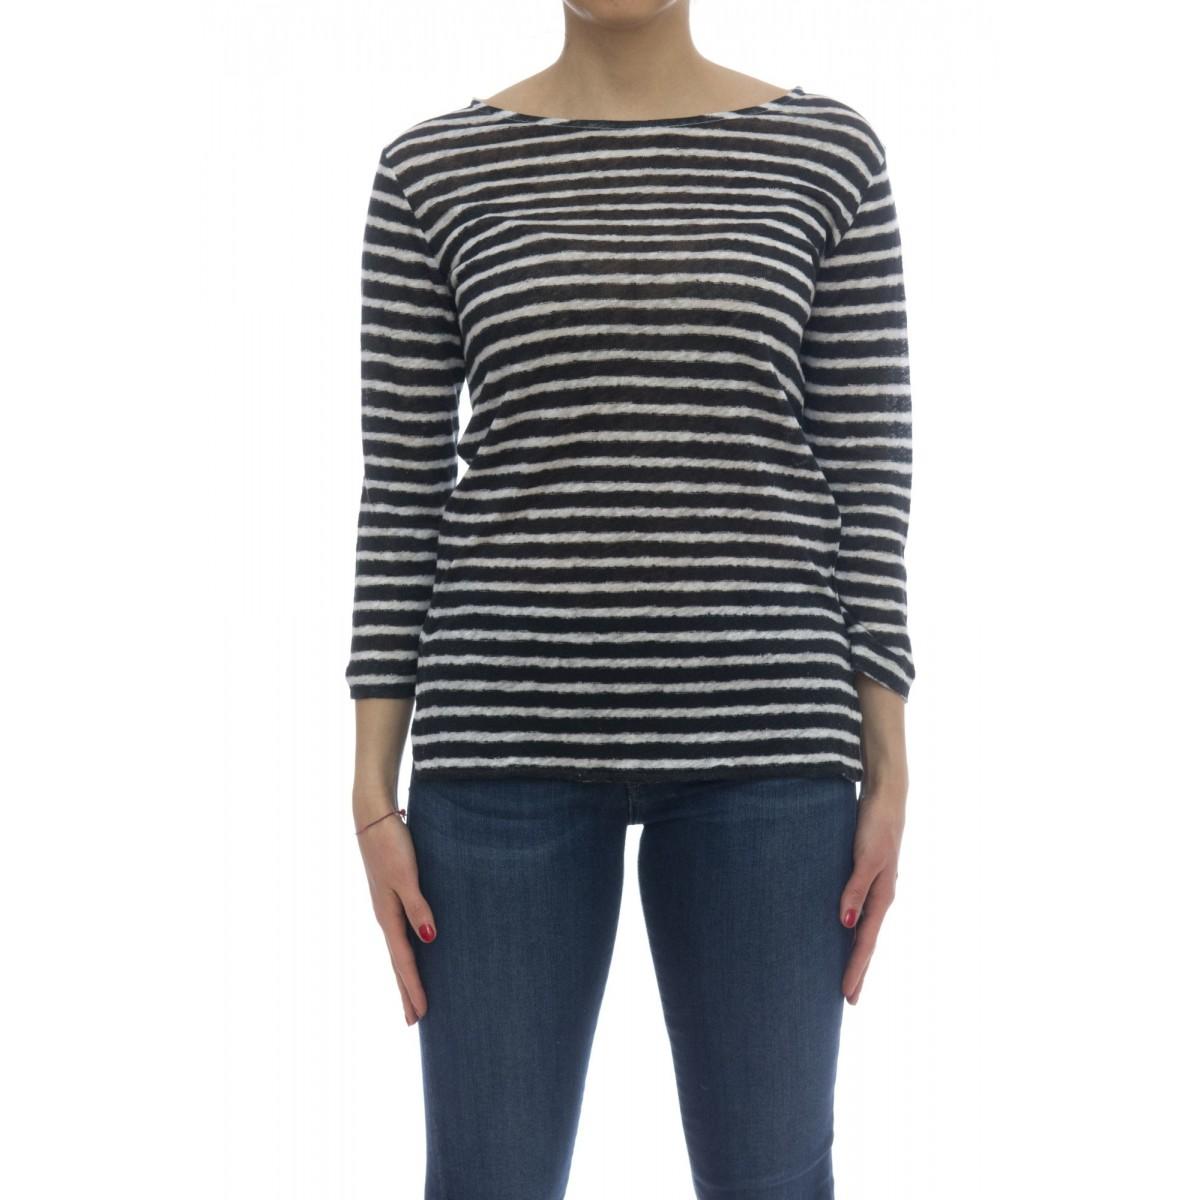 T-shirt - E29 07 t-shirt rigata 100% lino